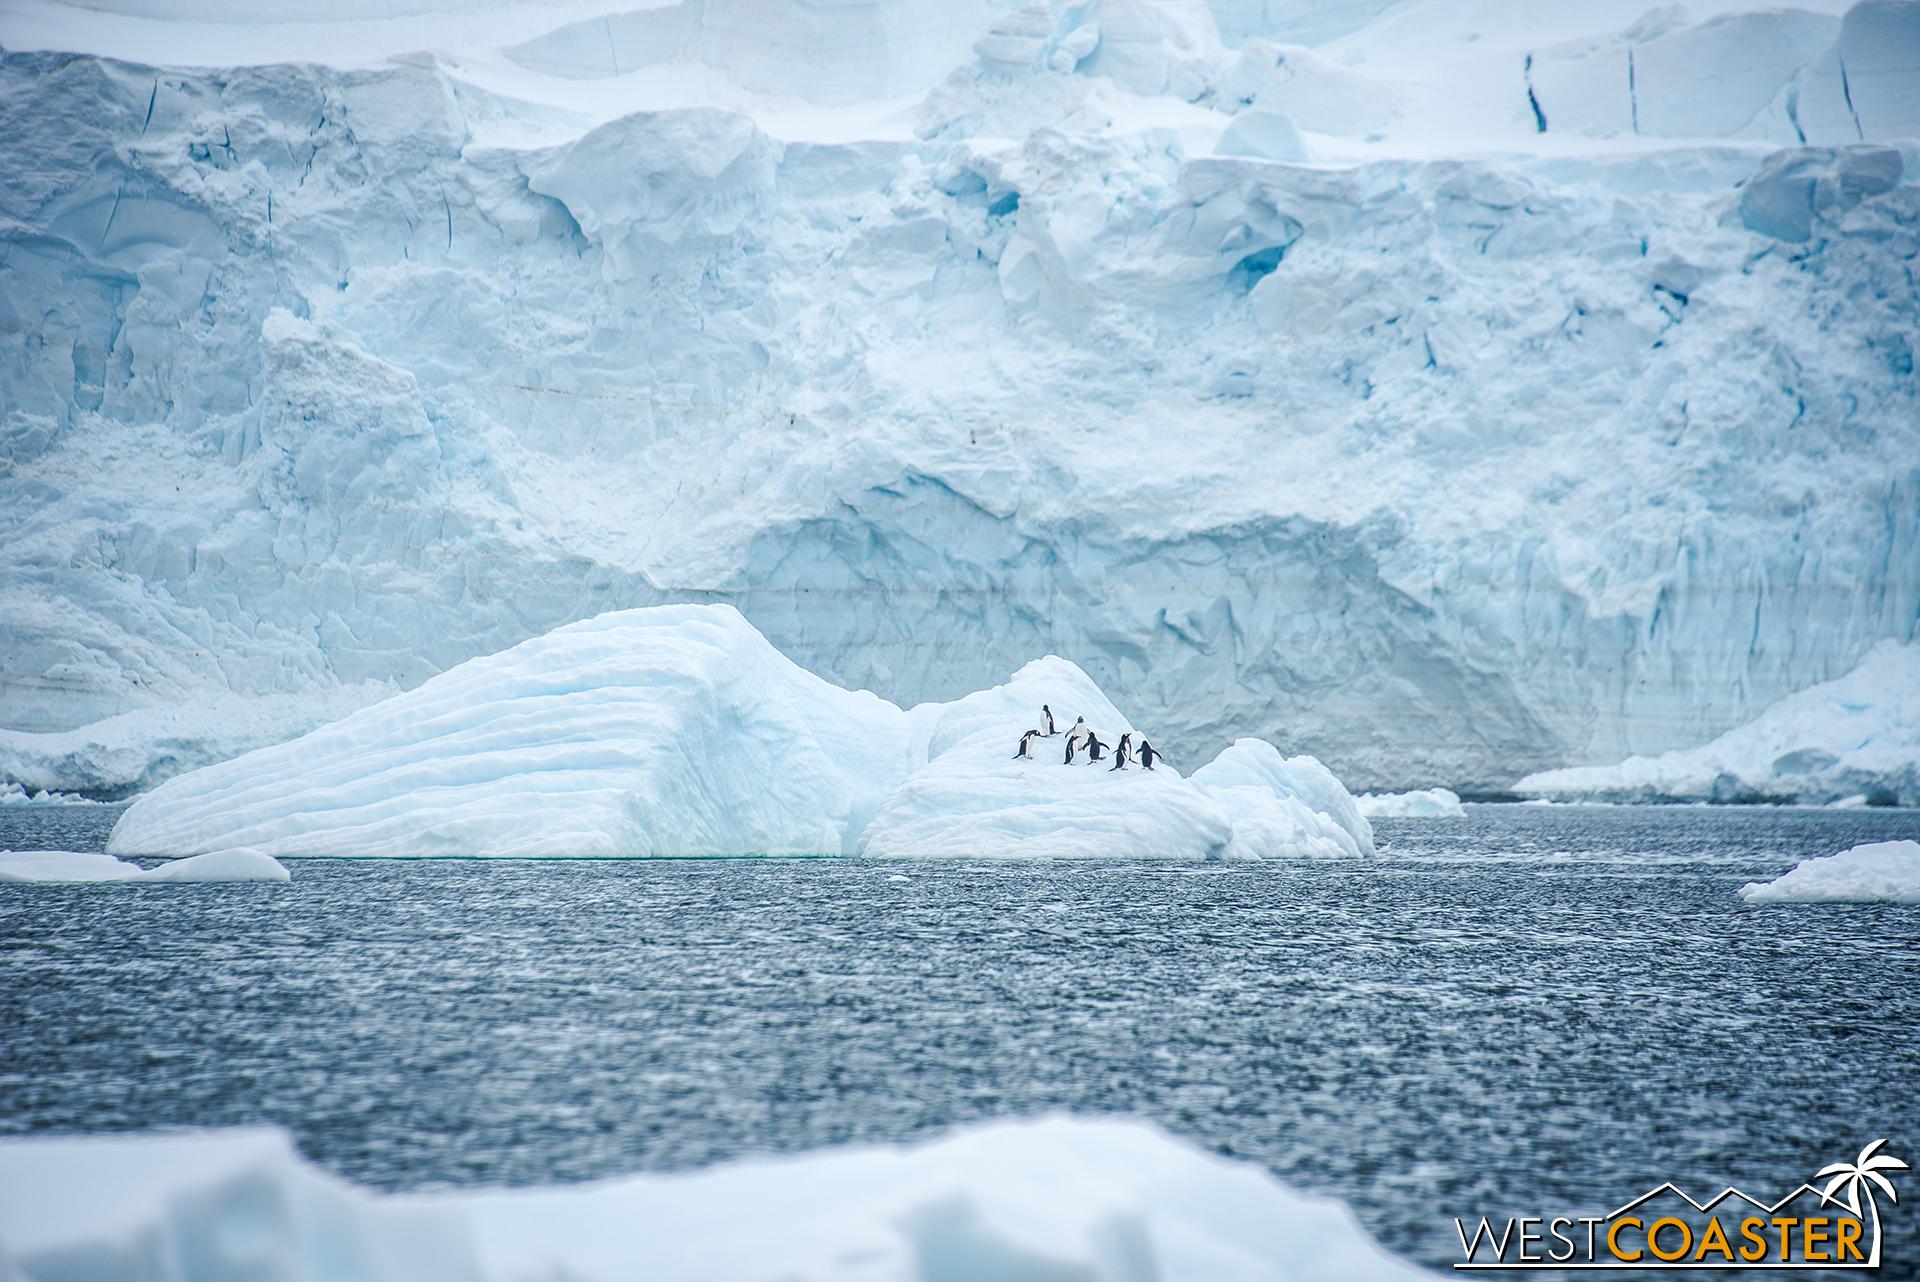 Some penguins call an iceberg home.